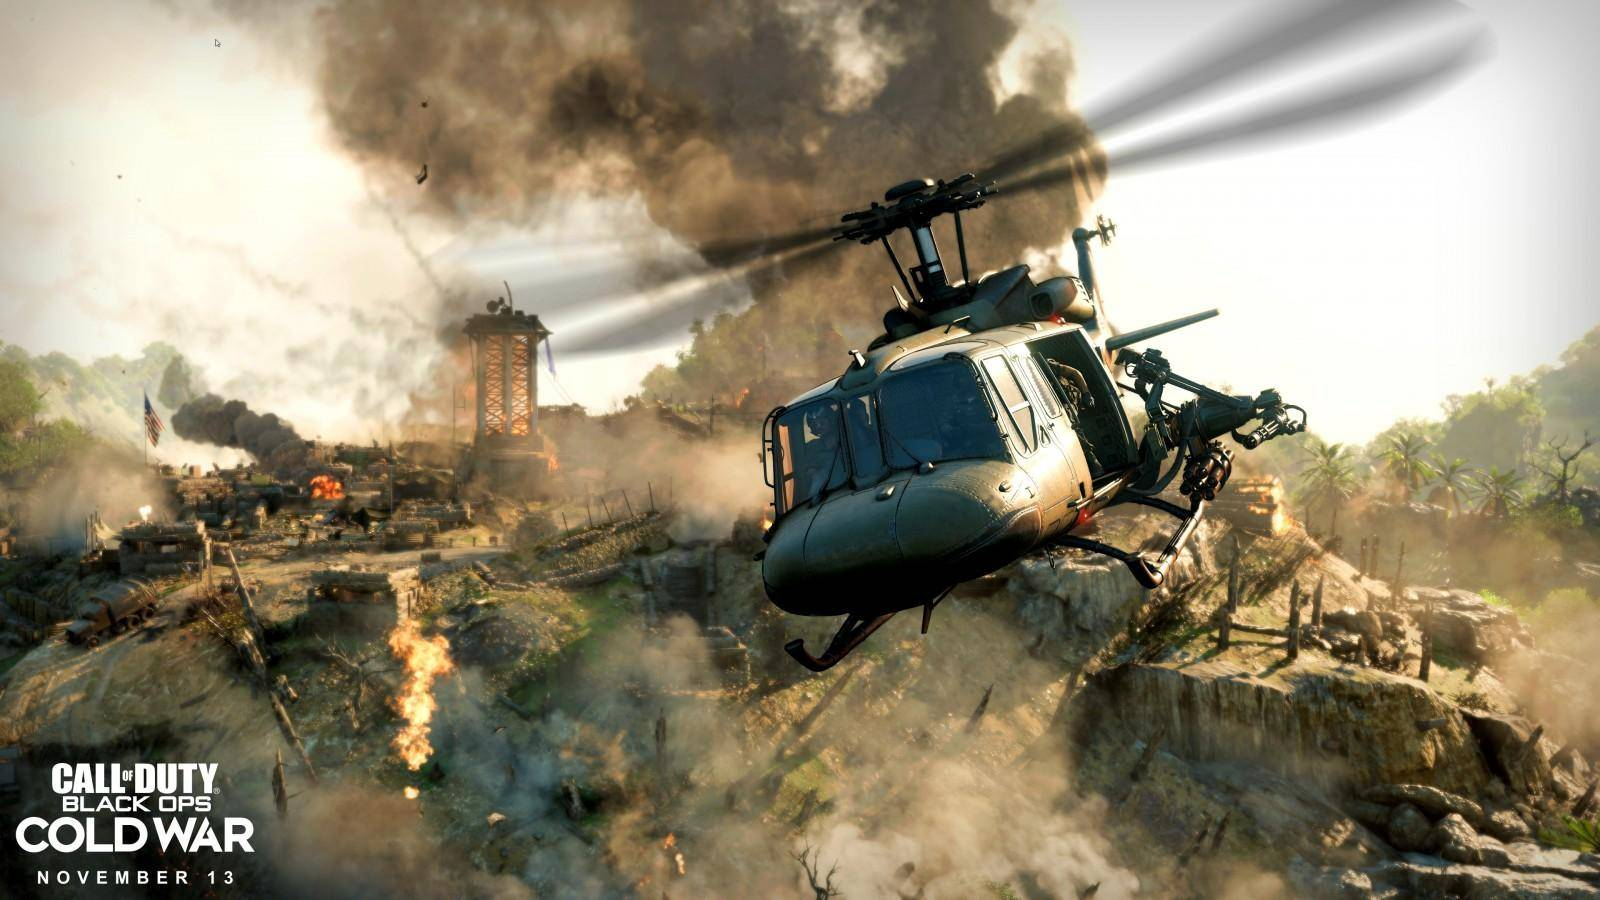 Se presenta el primer vistazo a Call of Duty: Cold War 1